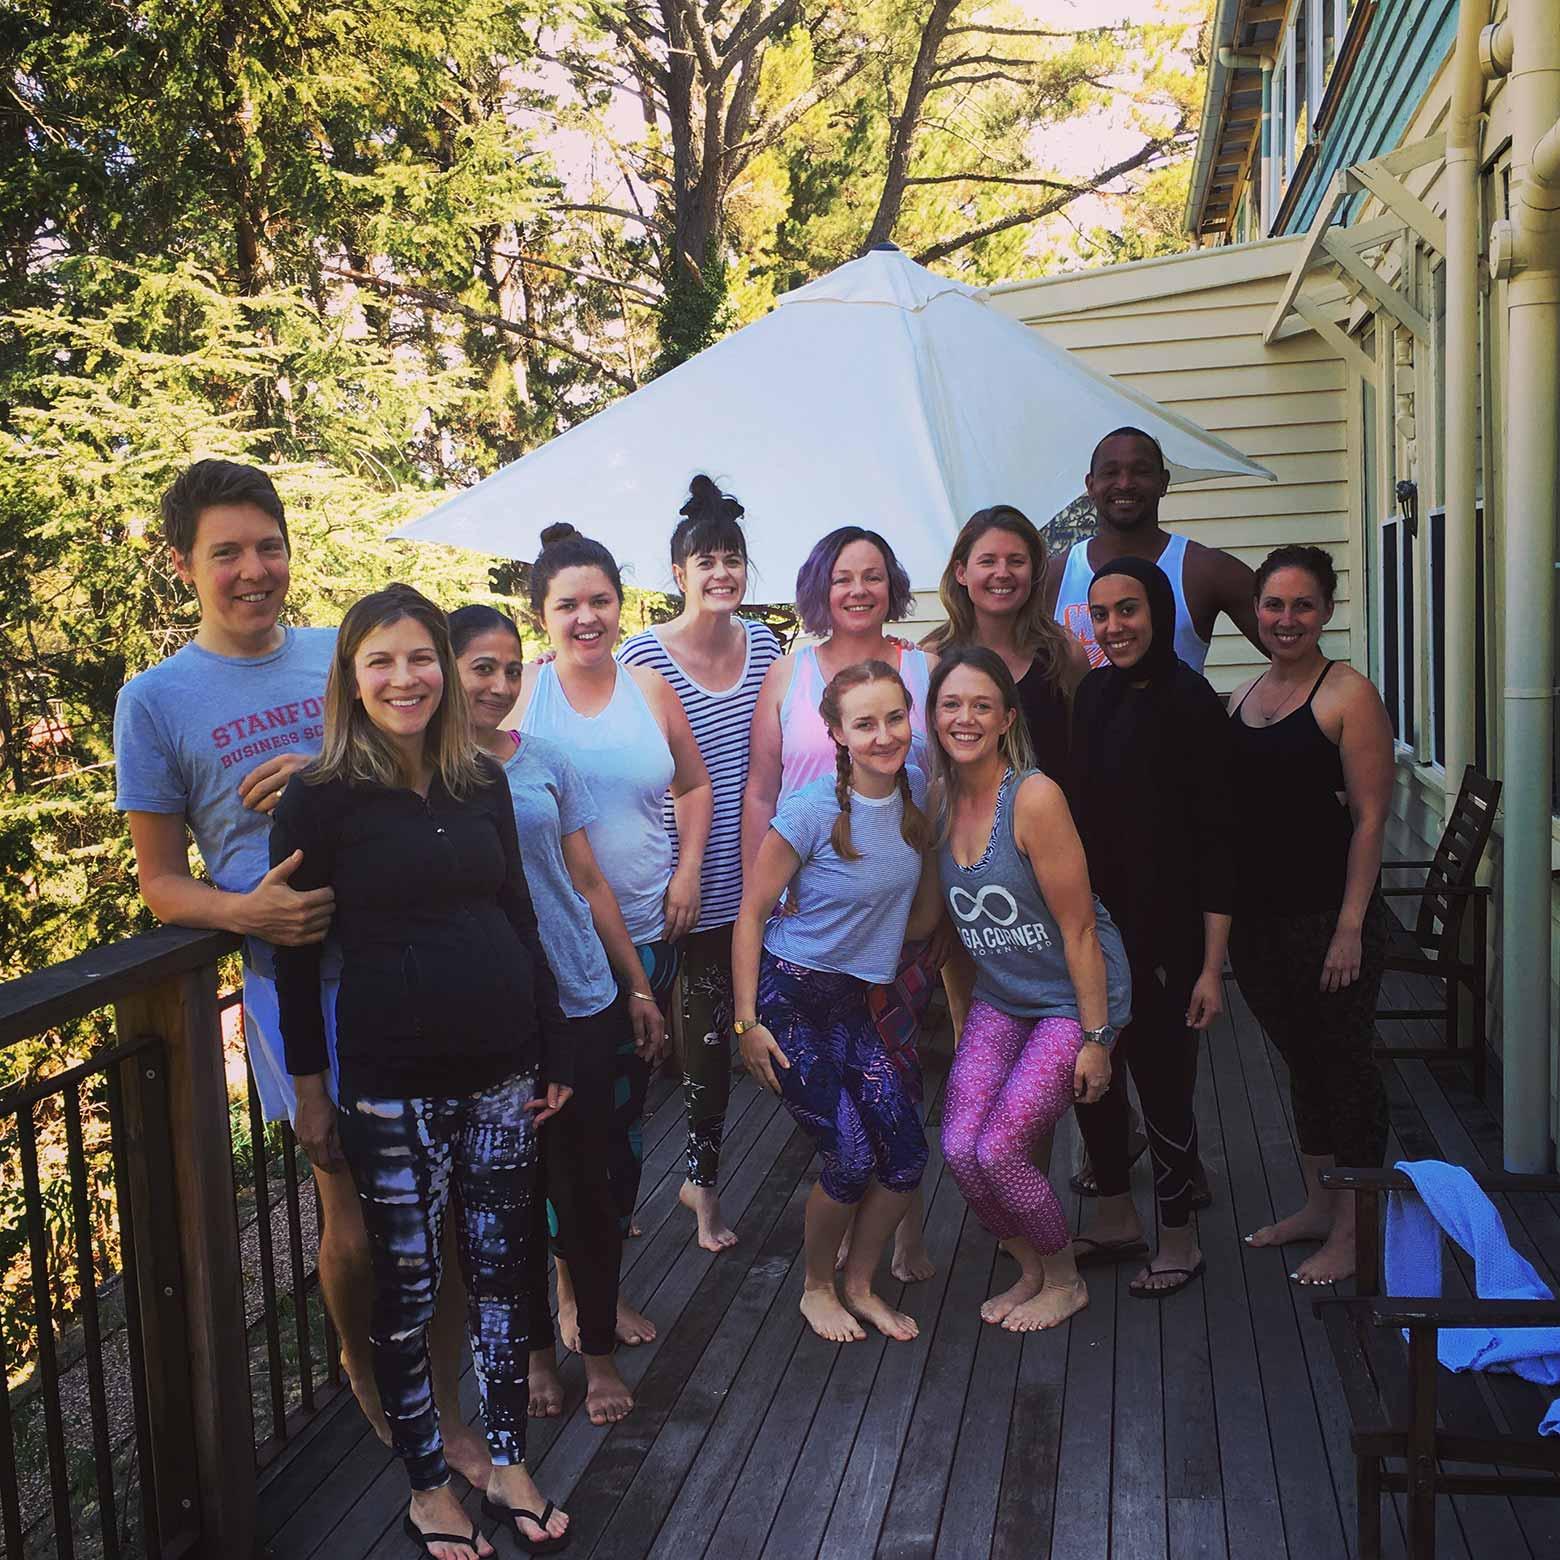 Daylesford-Hepburn-Springs-Yoga-Corner-Retreat-2016-March-Crew.jpg